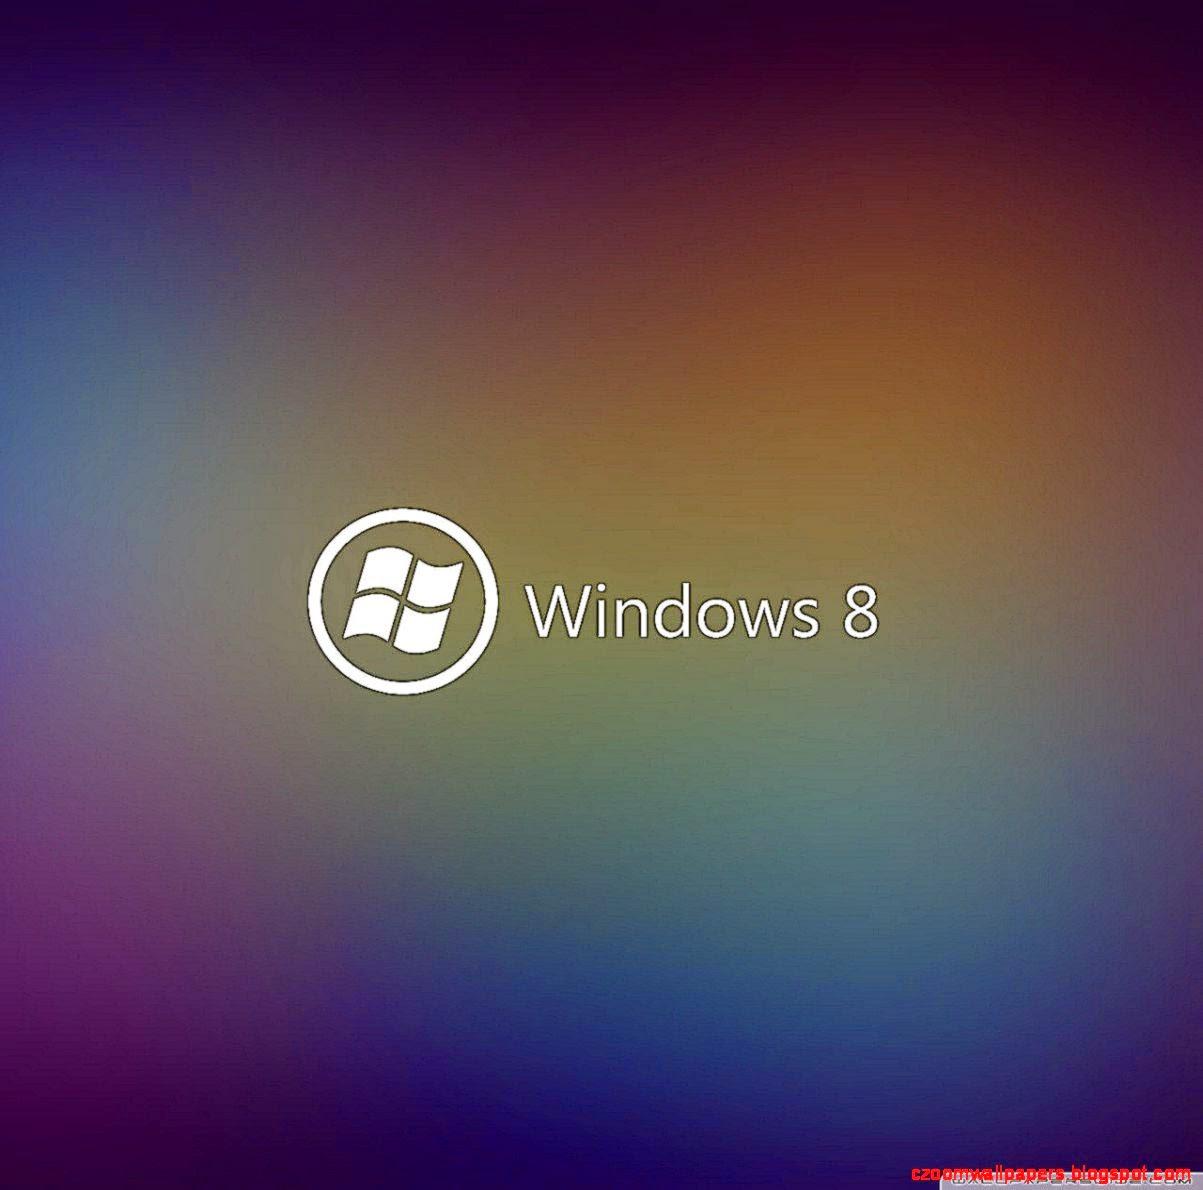 Windows 8 Purple HD desktop wallpaper  High Definition